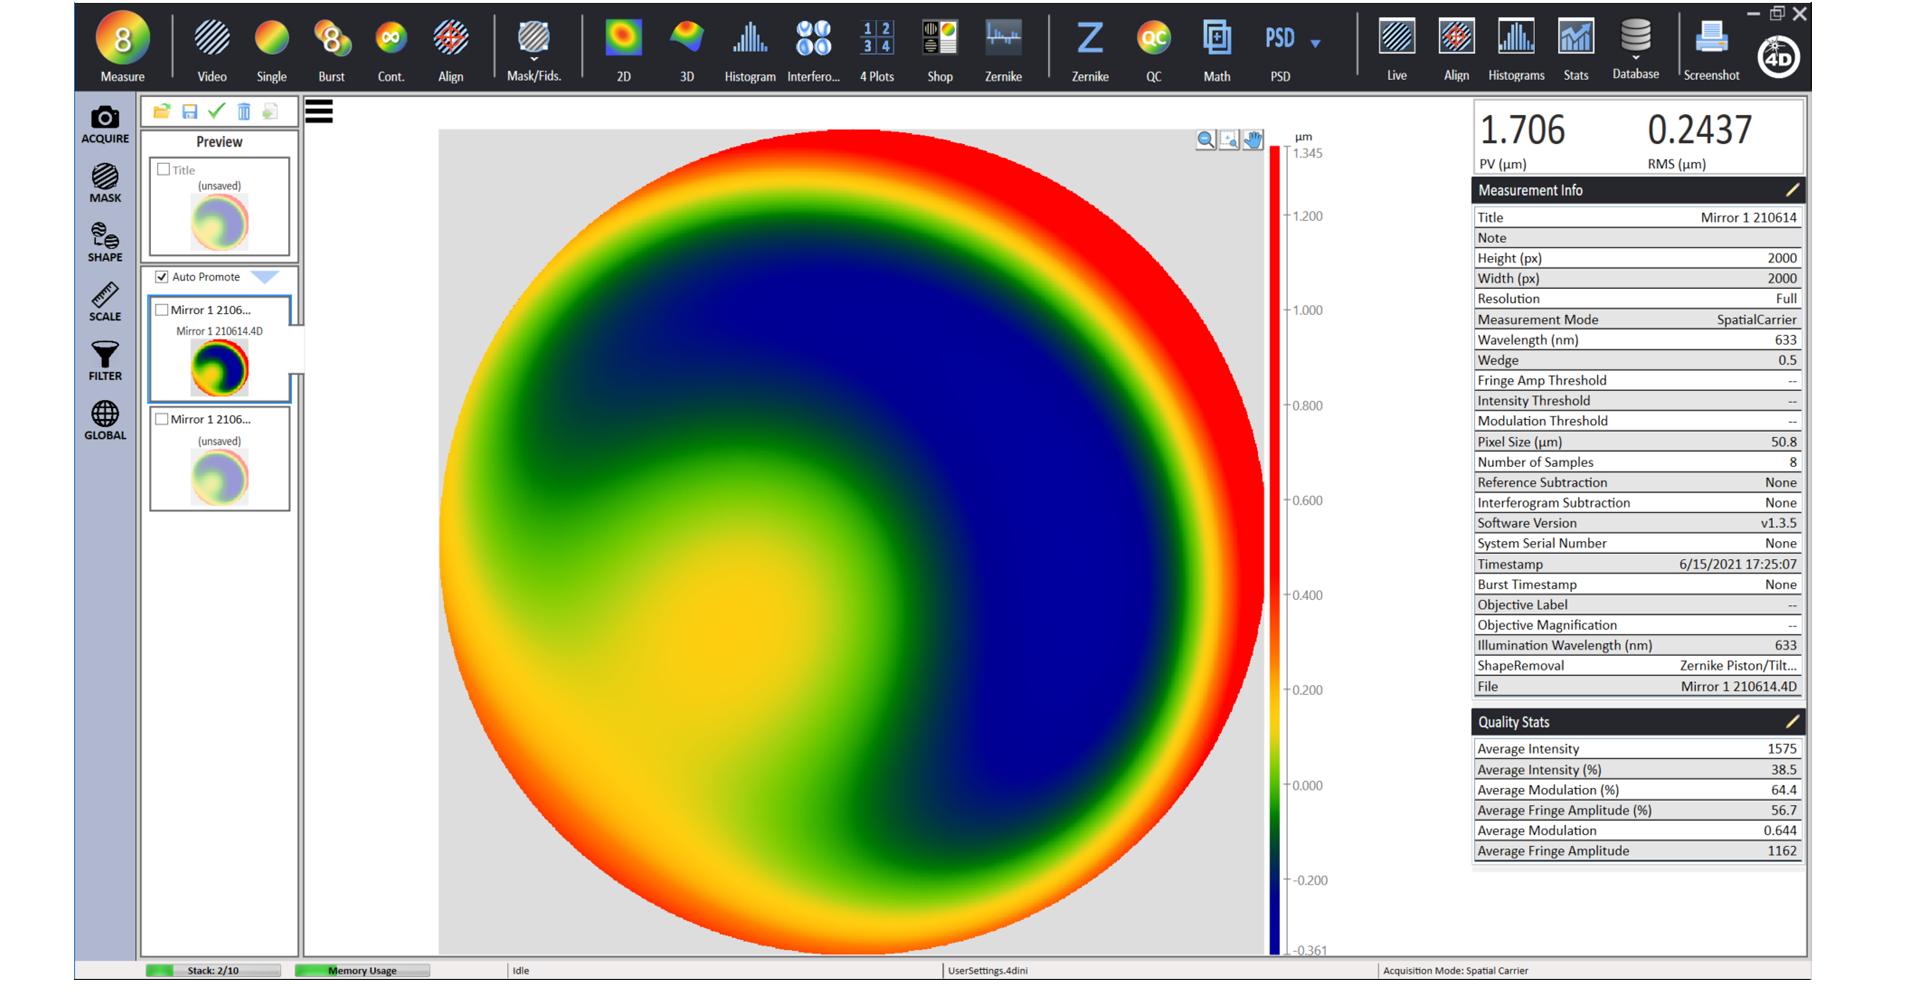 4Sight Focus Inteferometer Analysis Software